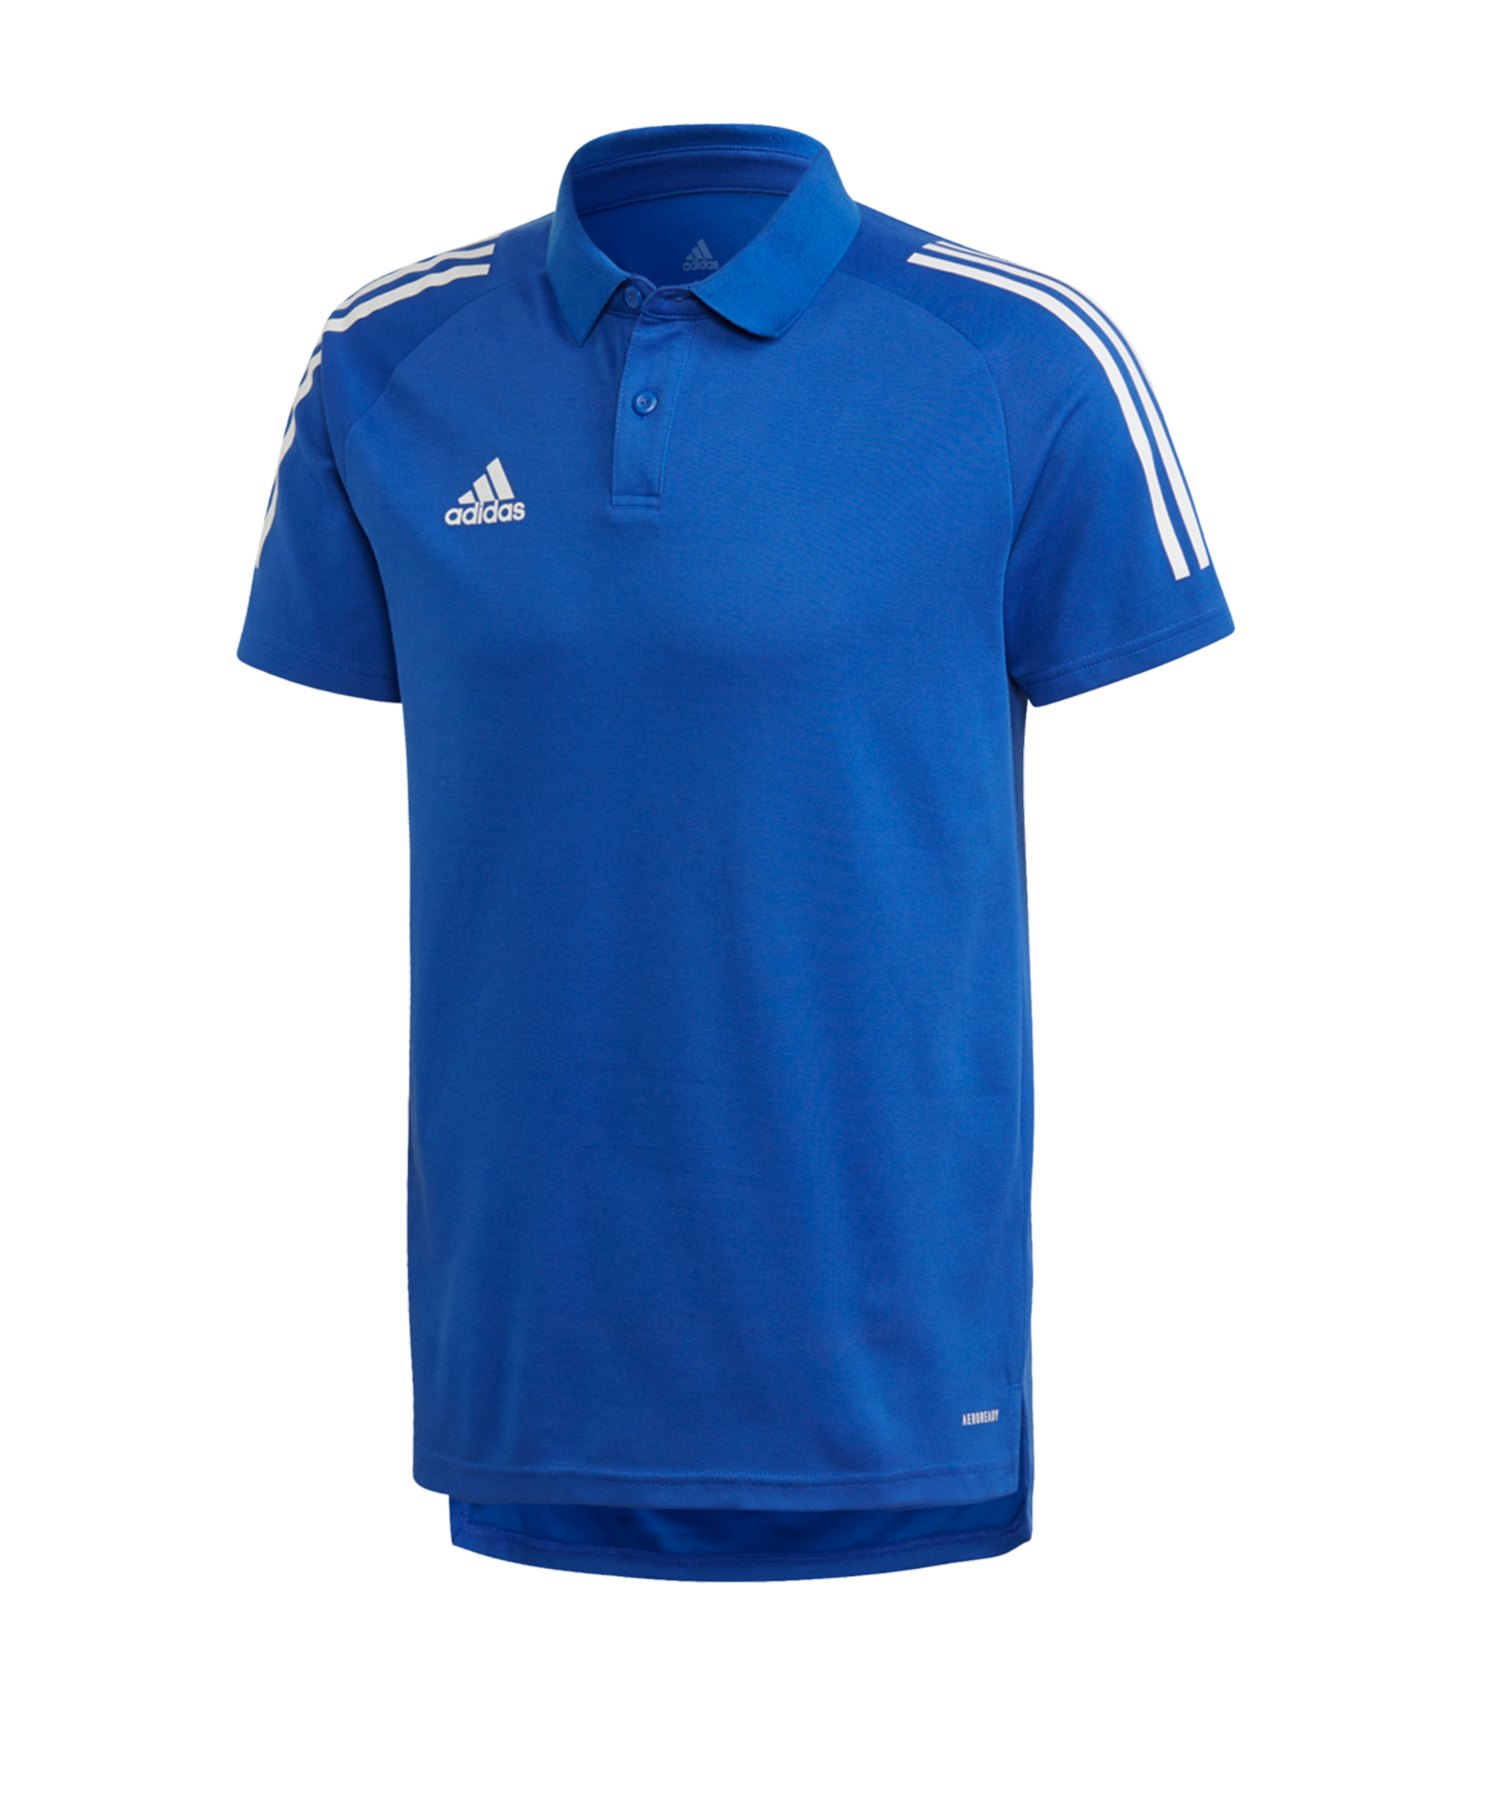 adidas Condivo 20 Poloshirt Blau Weiss - blau